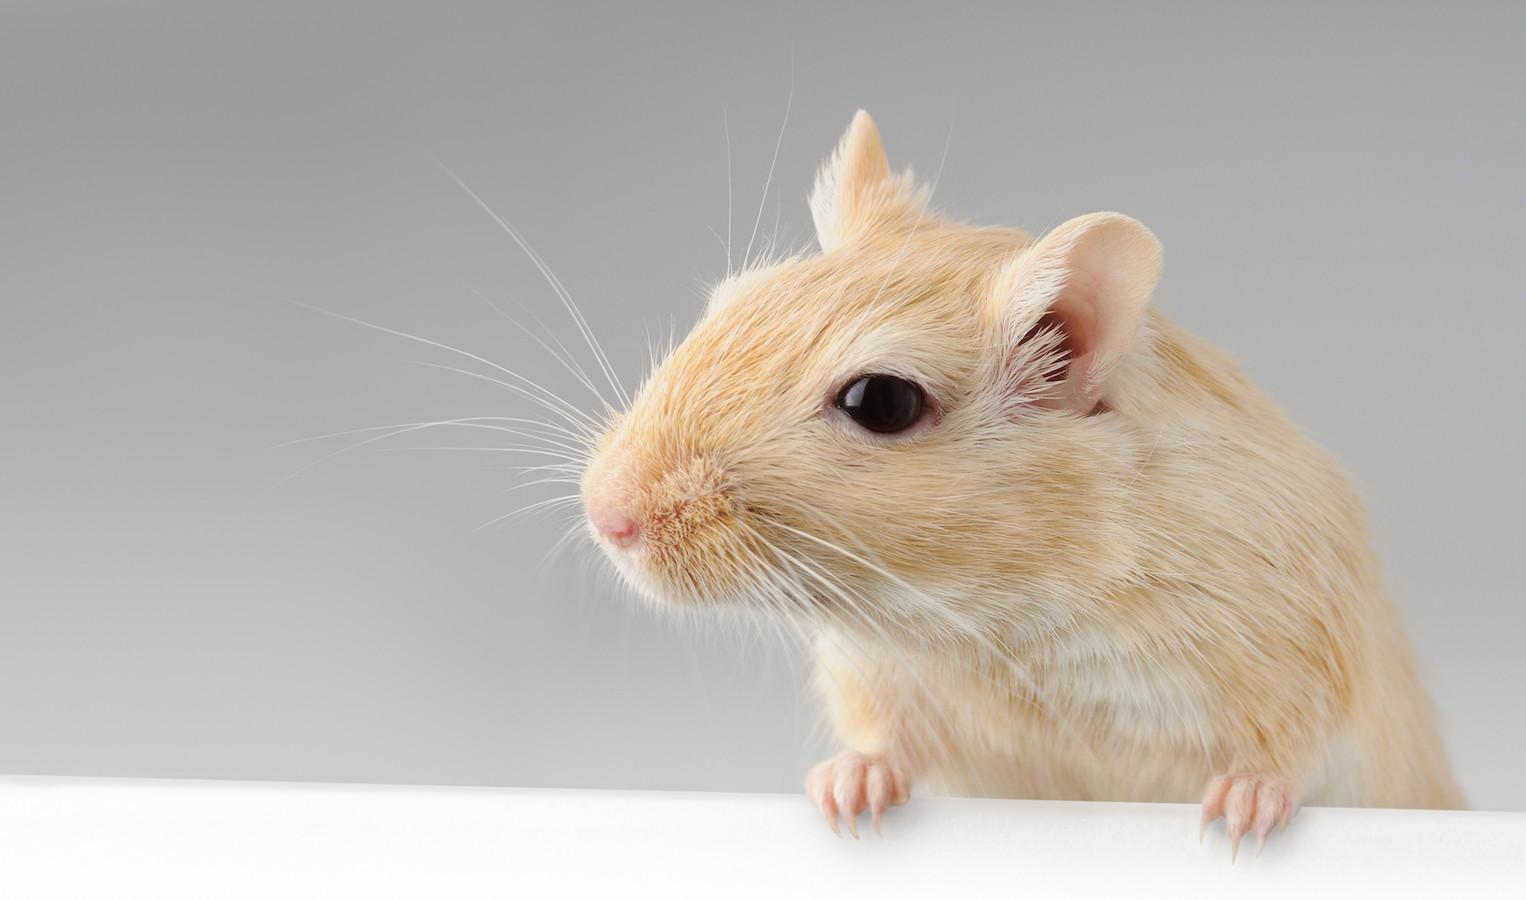 Cute little gerbil standing above white banner